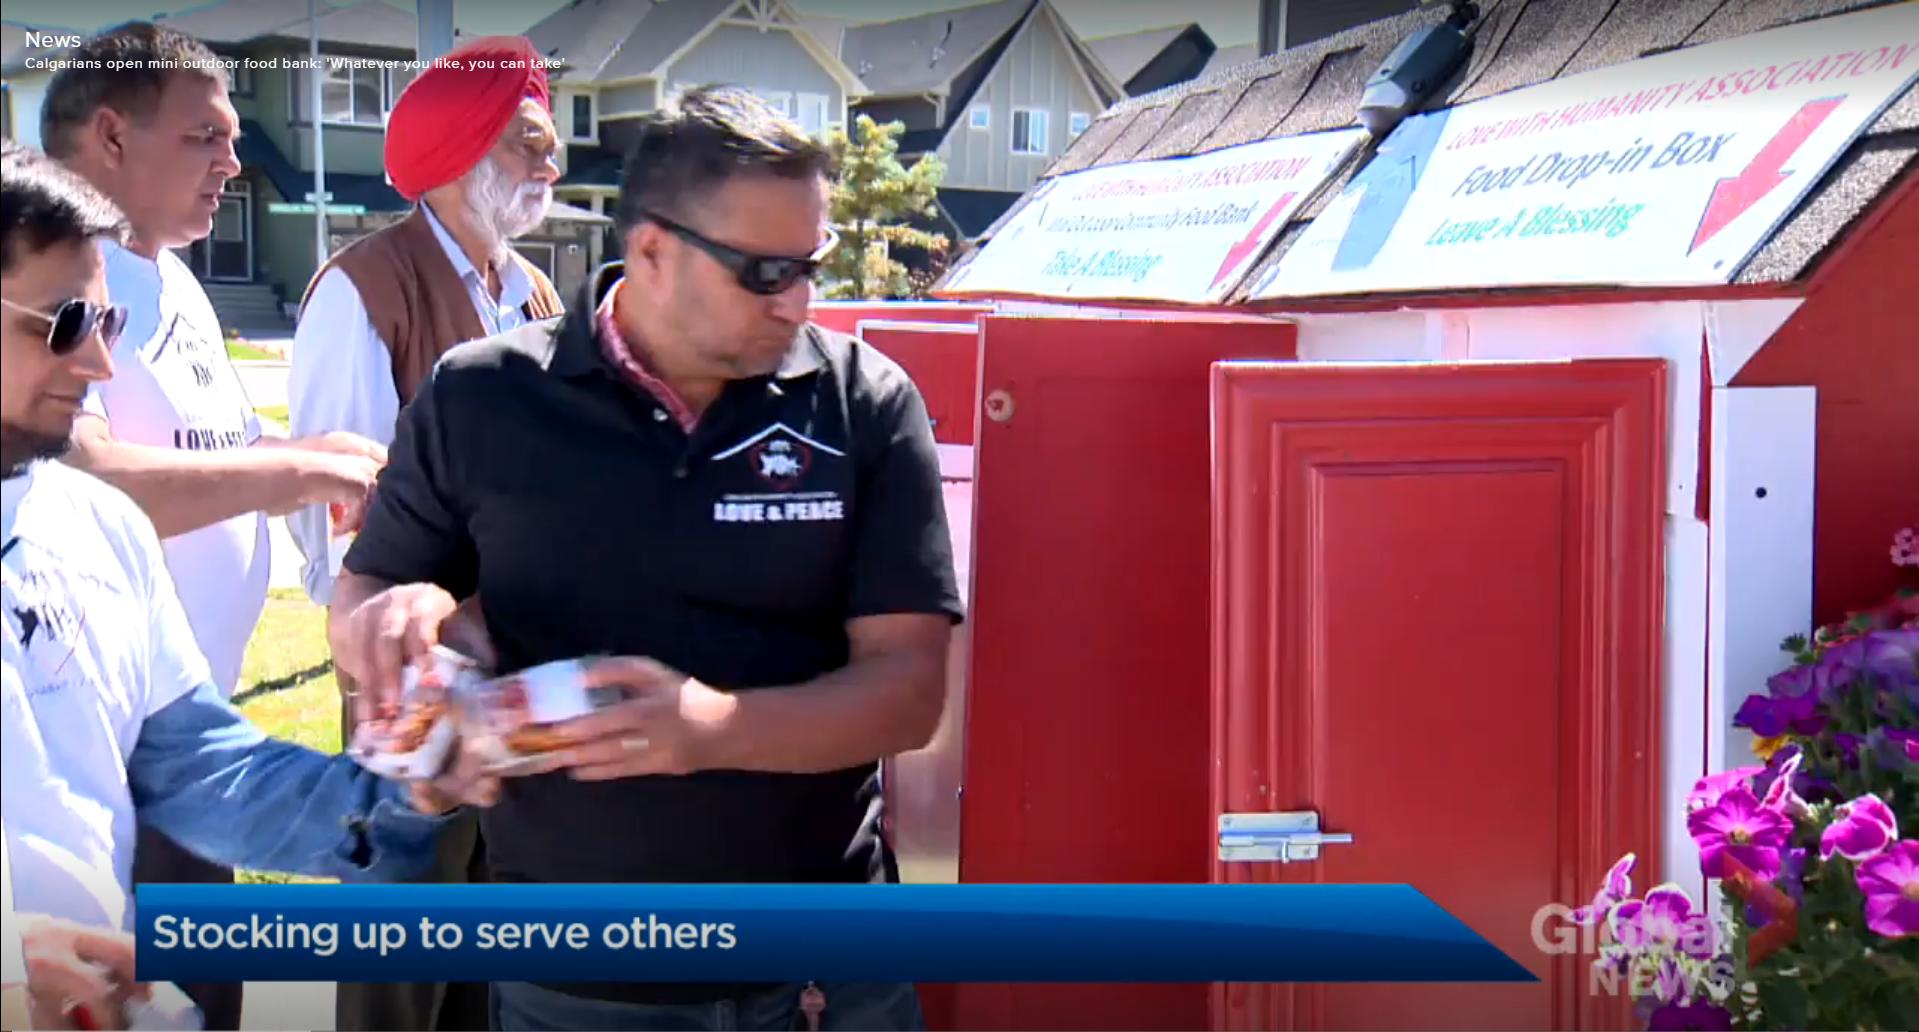 Calgary group launches mini food bank